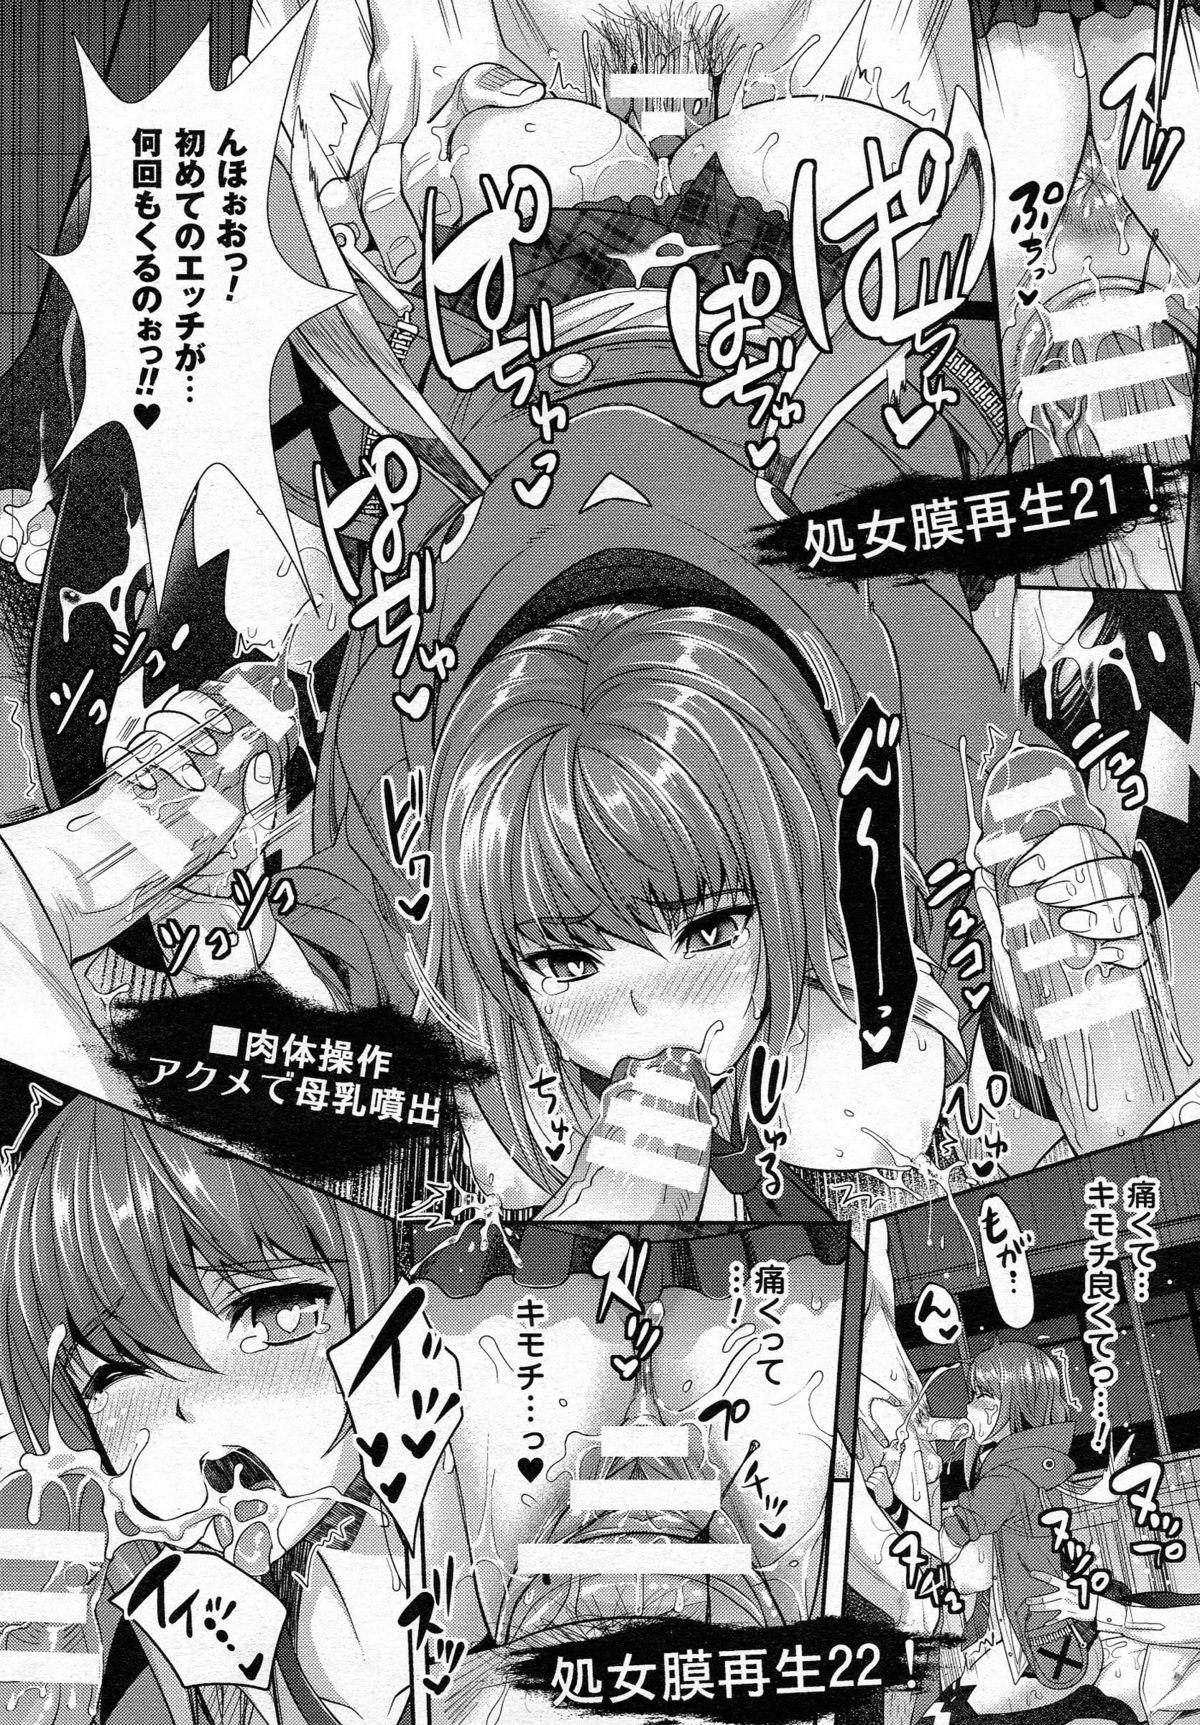 COMIC Unreal 2015-06 Vol. 55 + Hisasi Illust Shuu 262